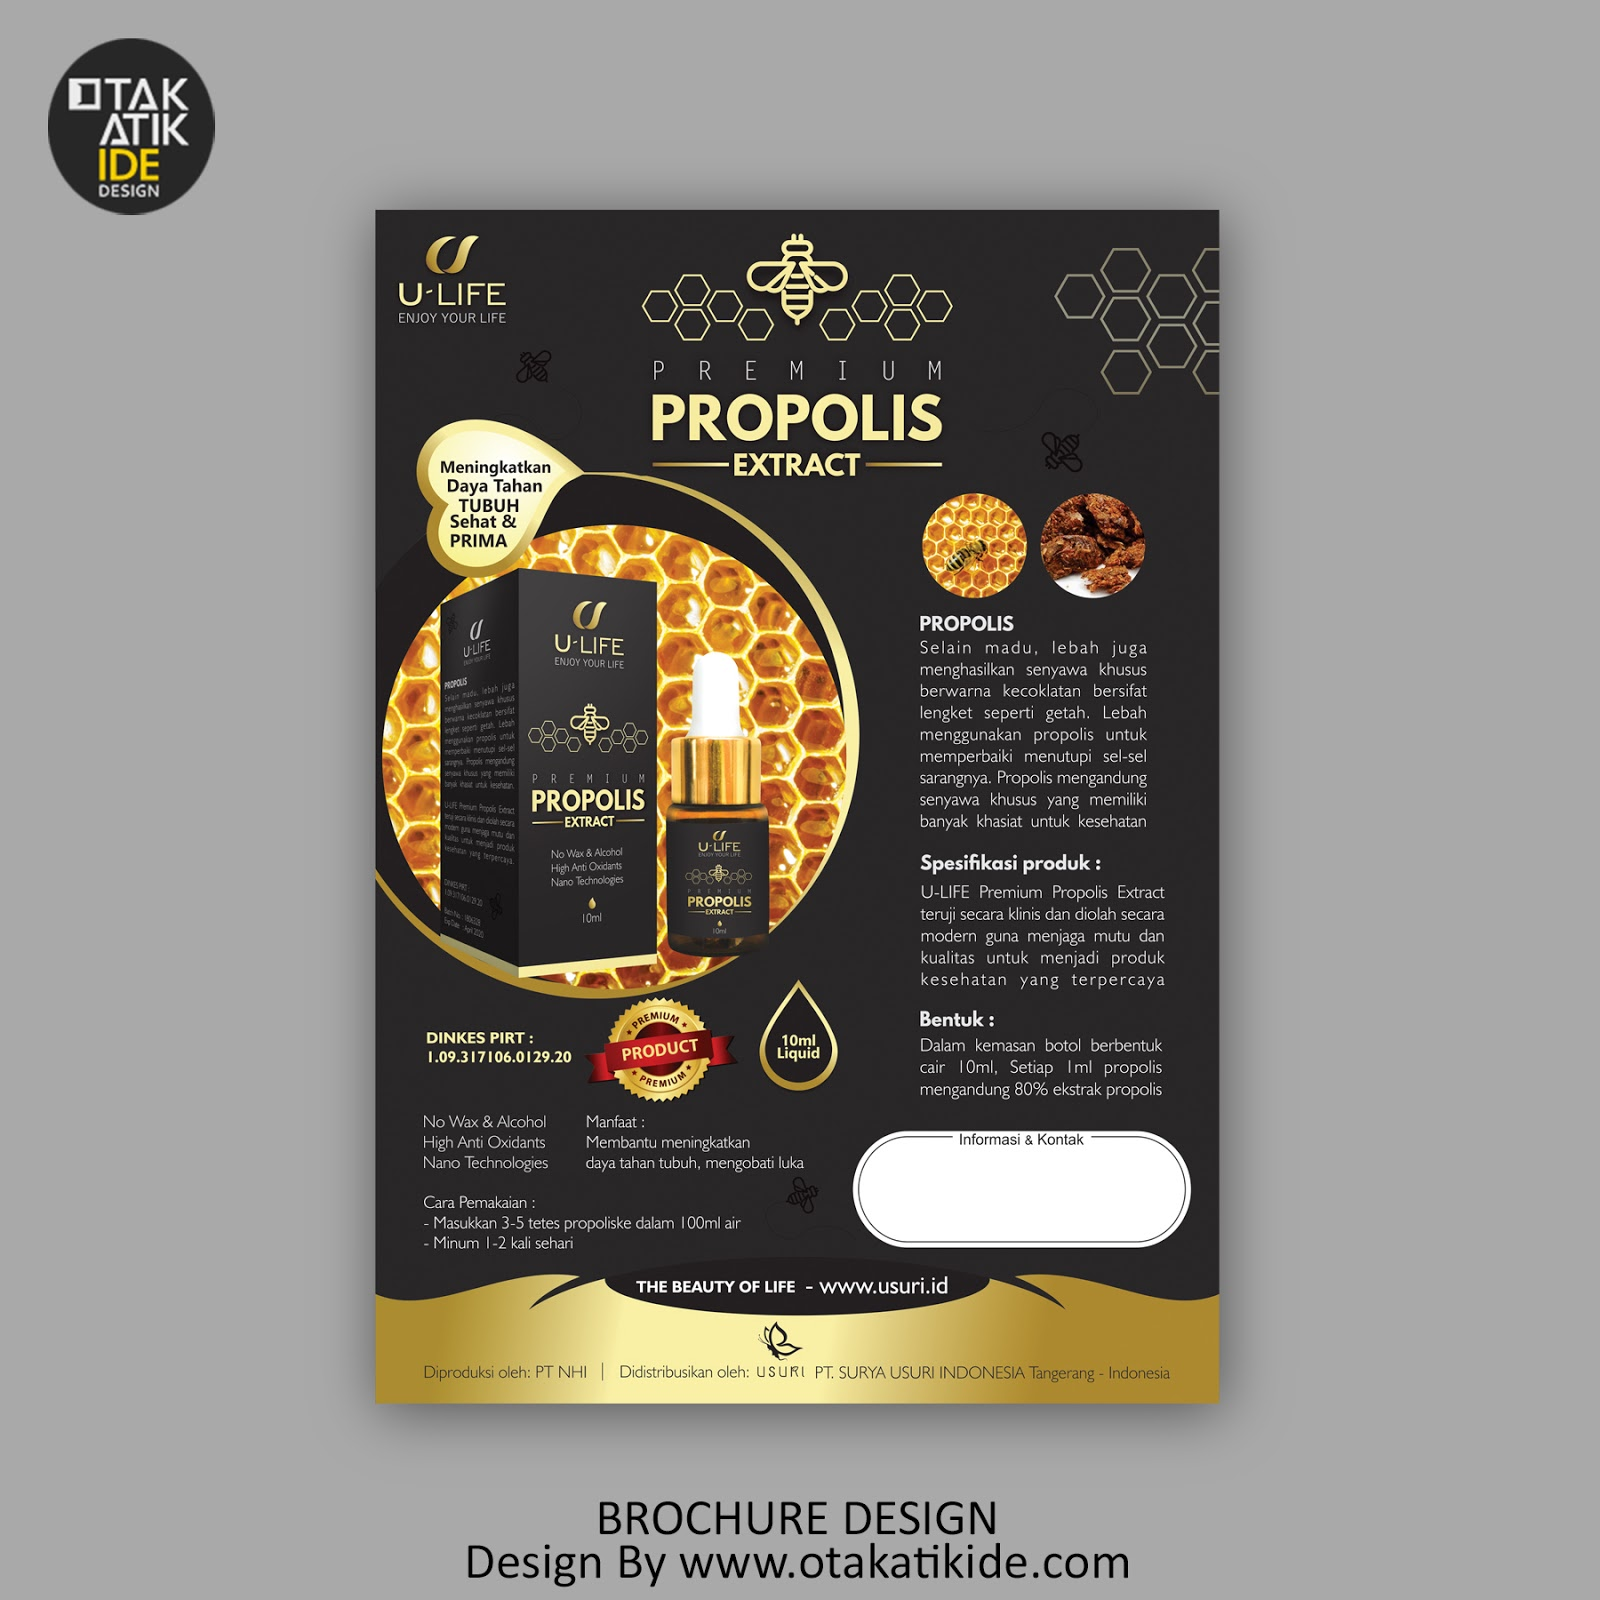 Jasa Desain Brosur Promosi Otakatikide Branding Design Consultant